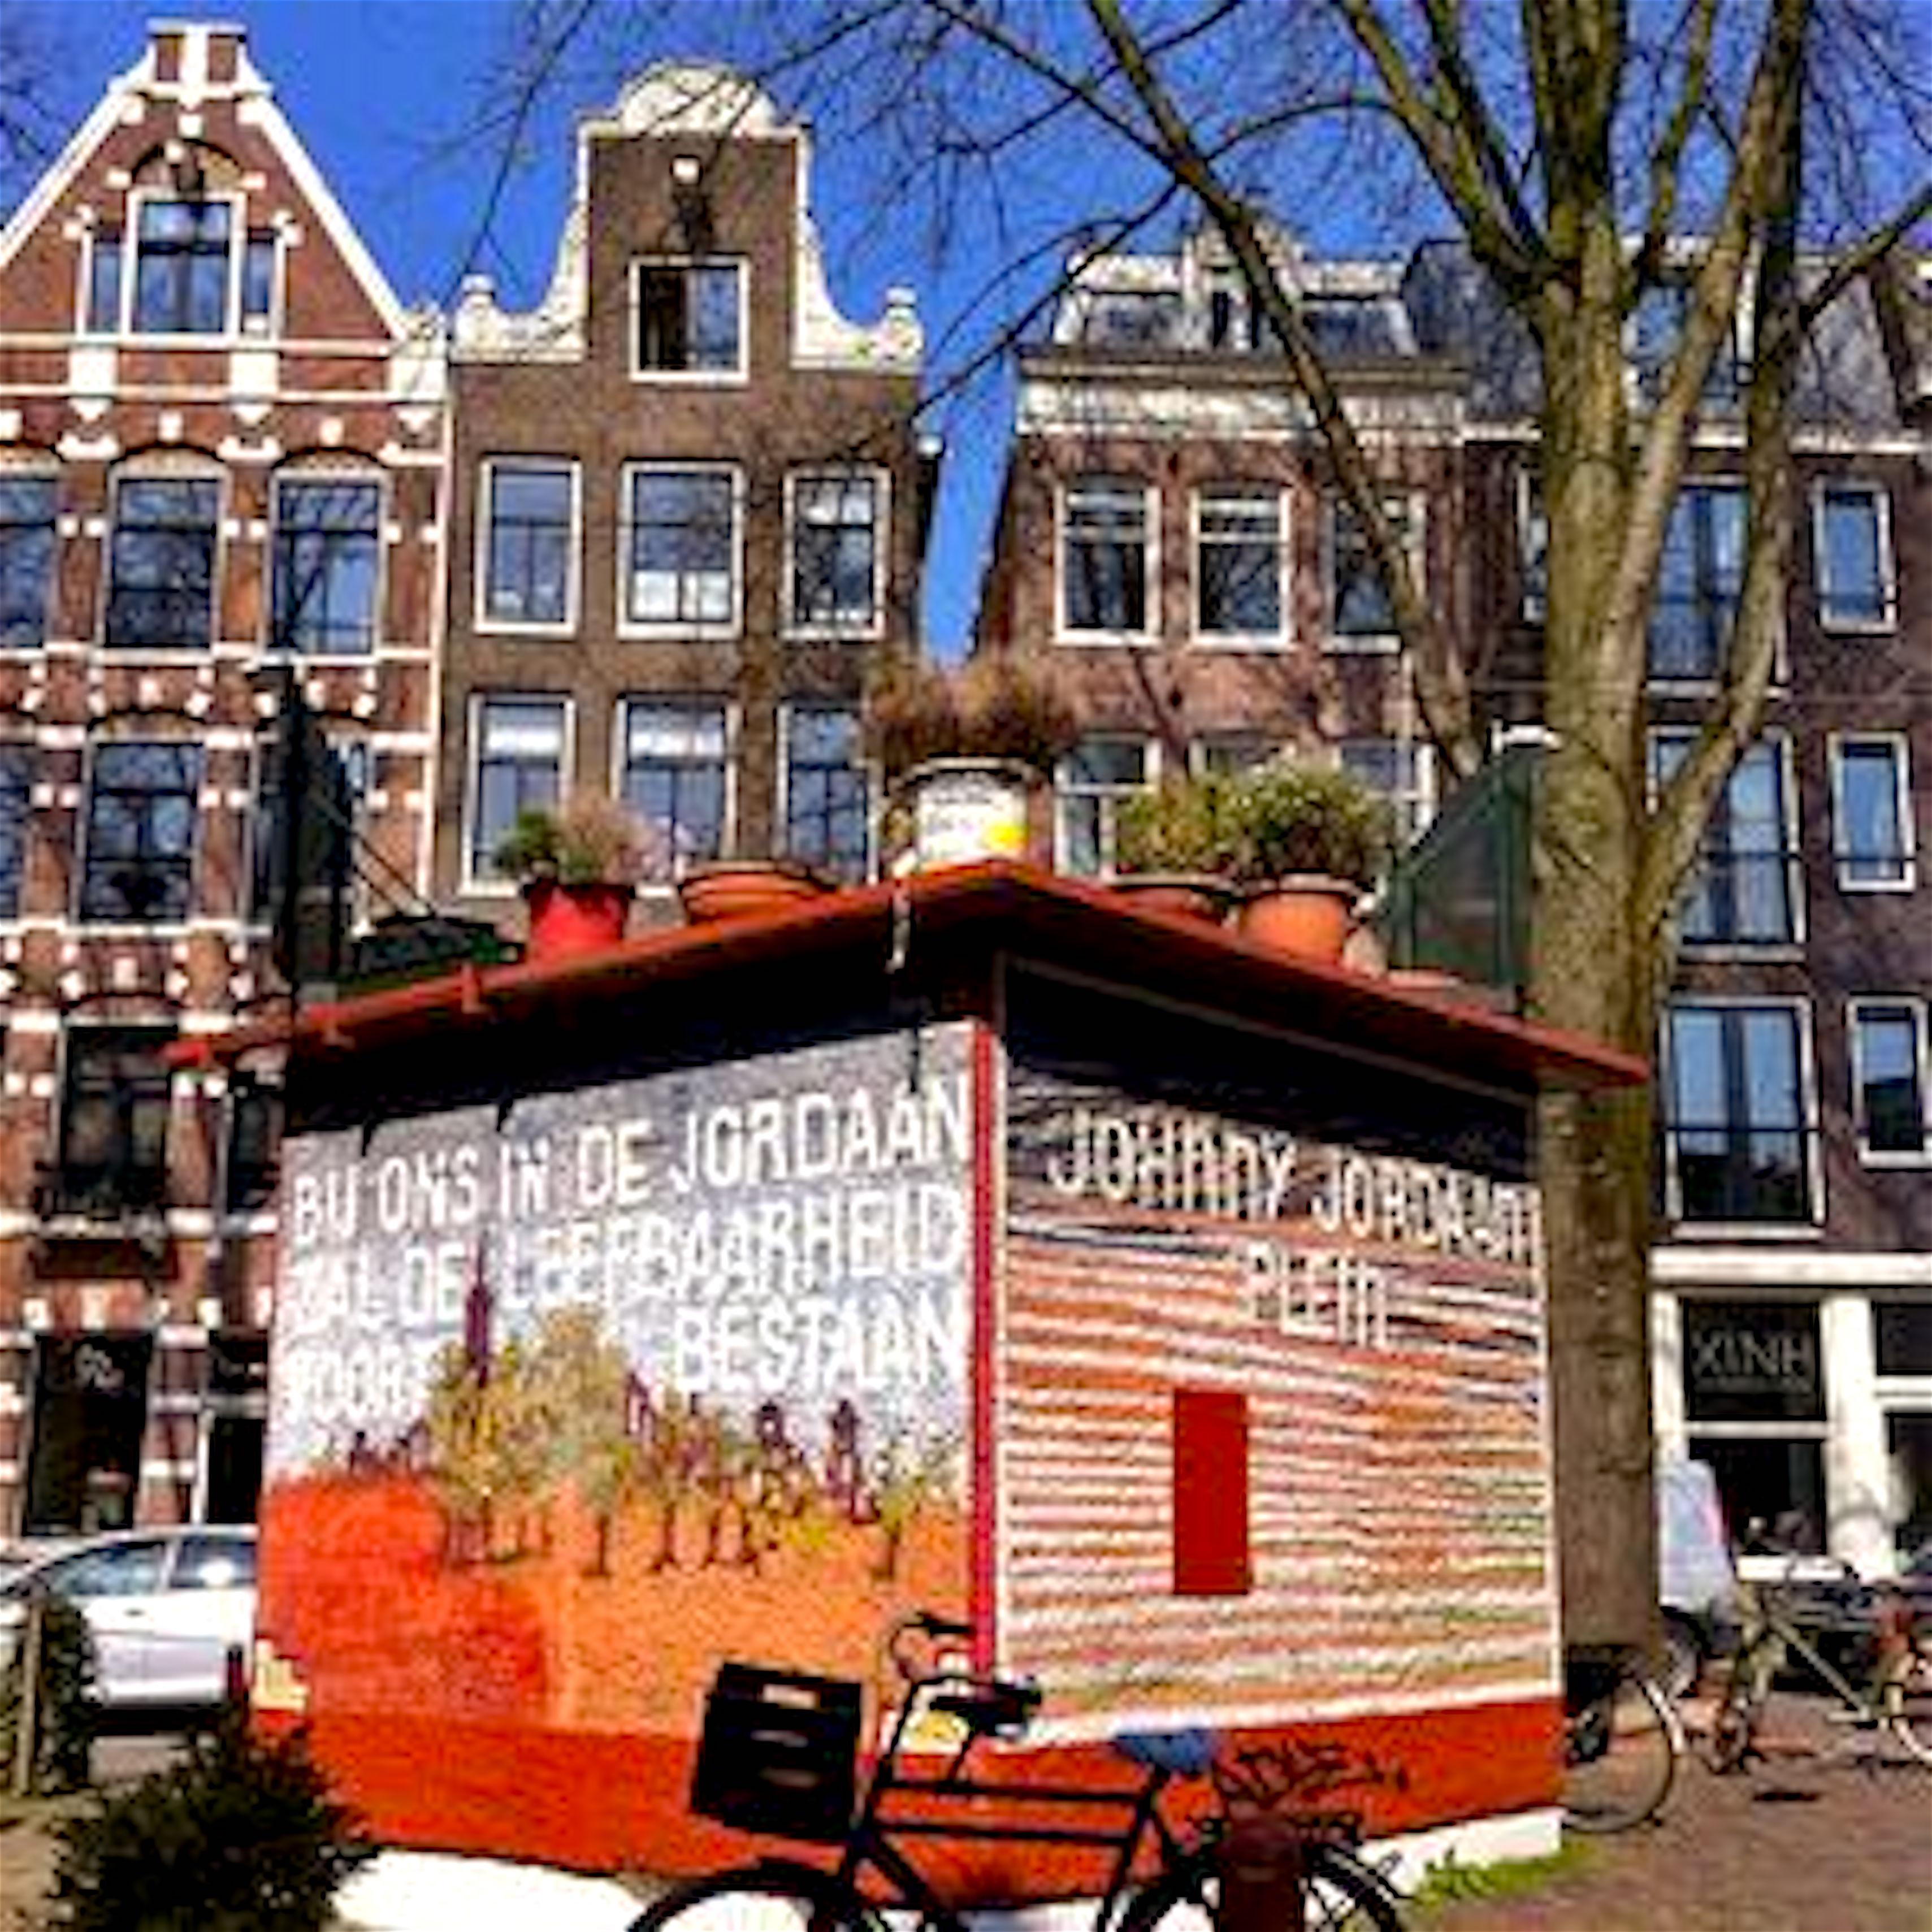 In de Jordaan, Elandsgracht (foto Amsterdam City Hipster Guide)